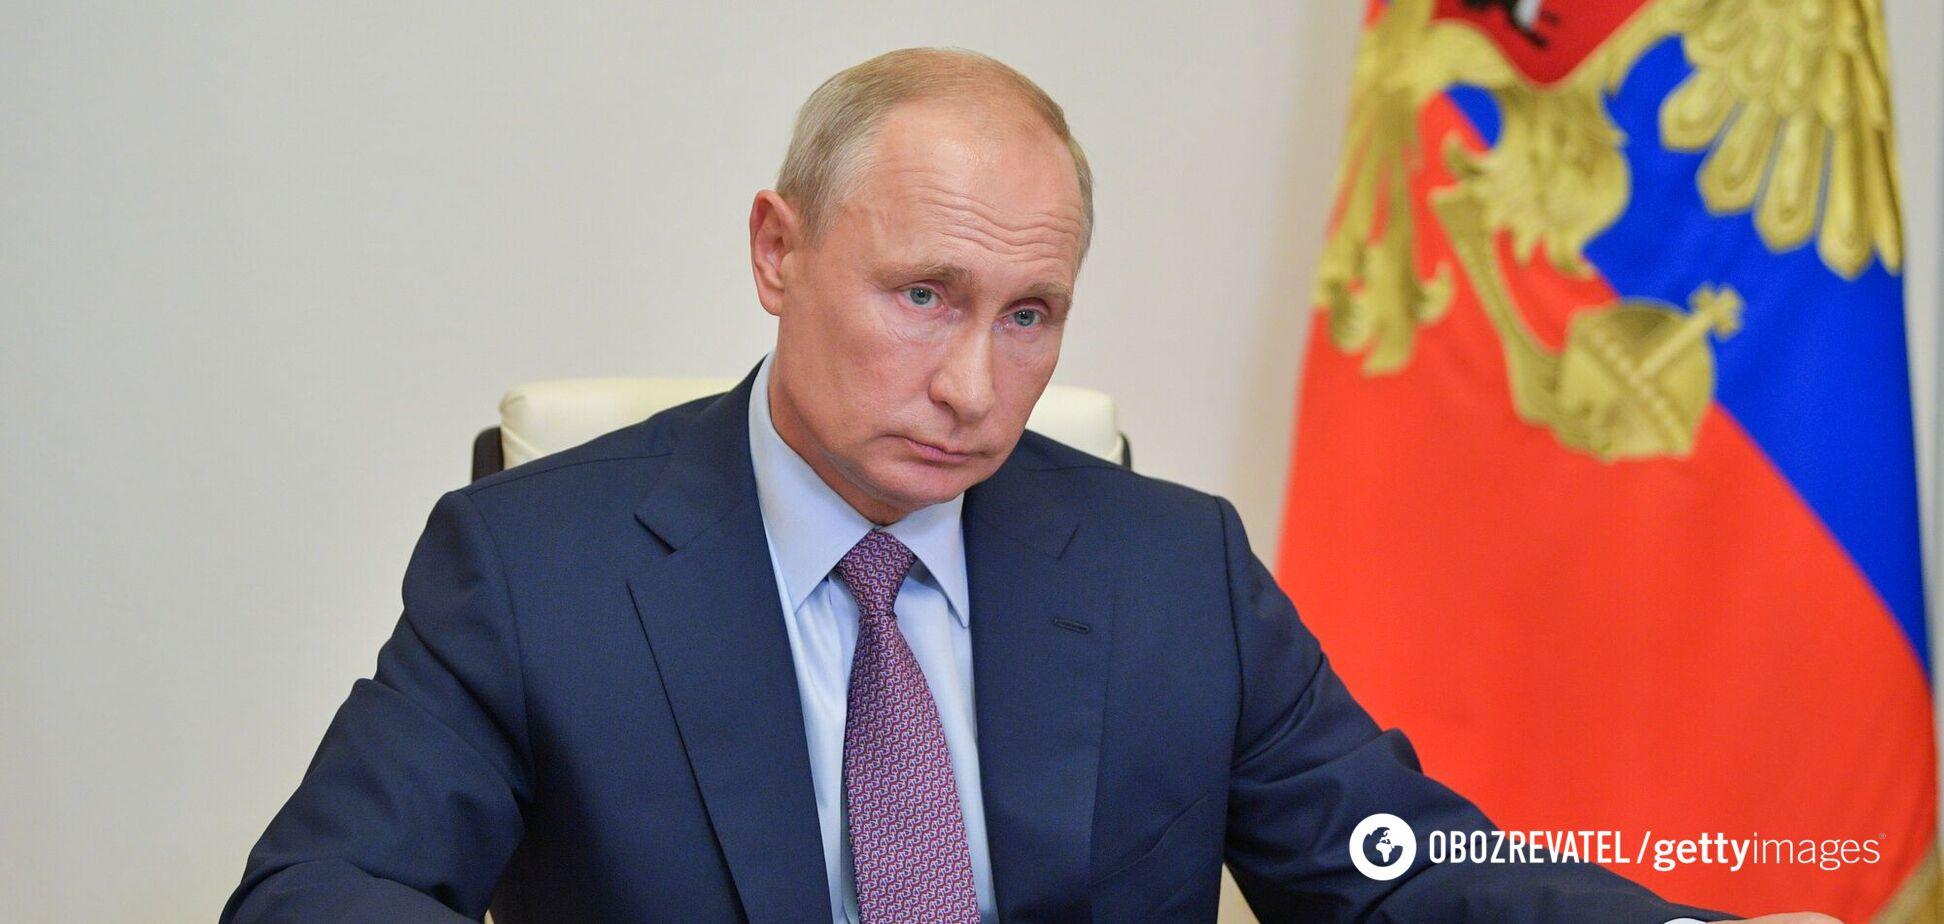 Путин настроен реабилитировать 'пакт Молотова-Риббентропа'